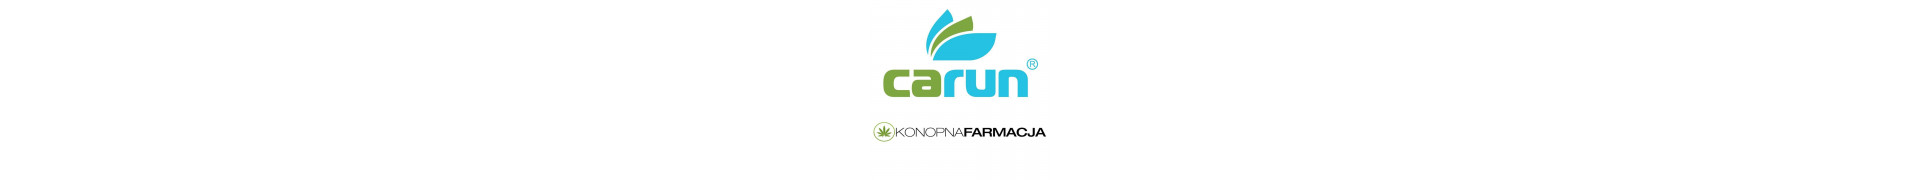 Carun